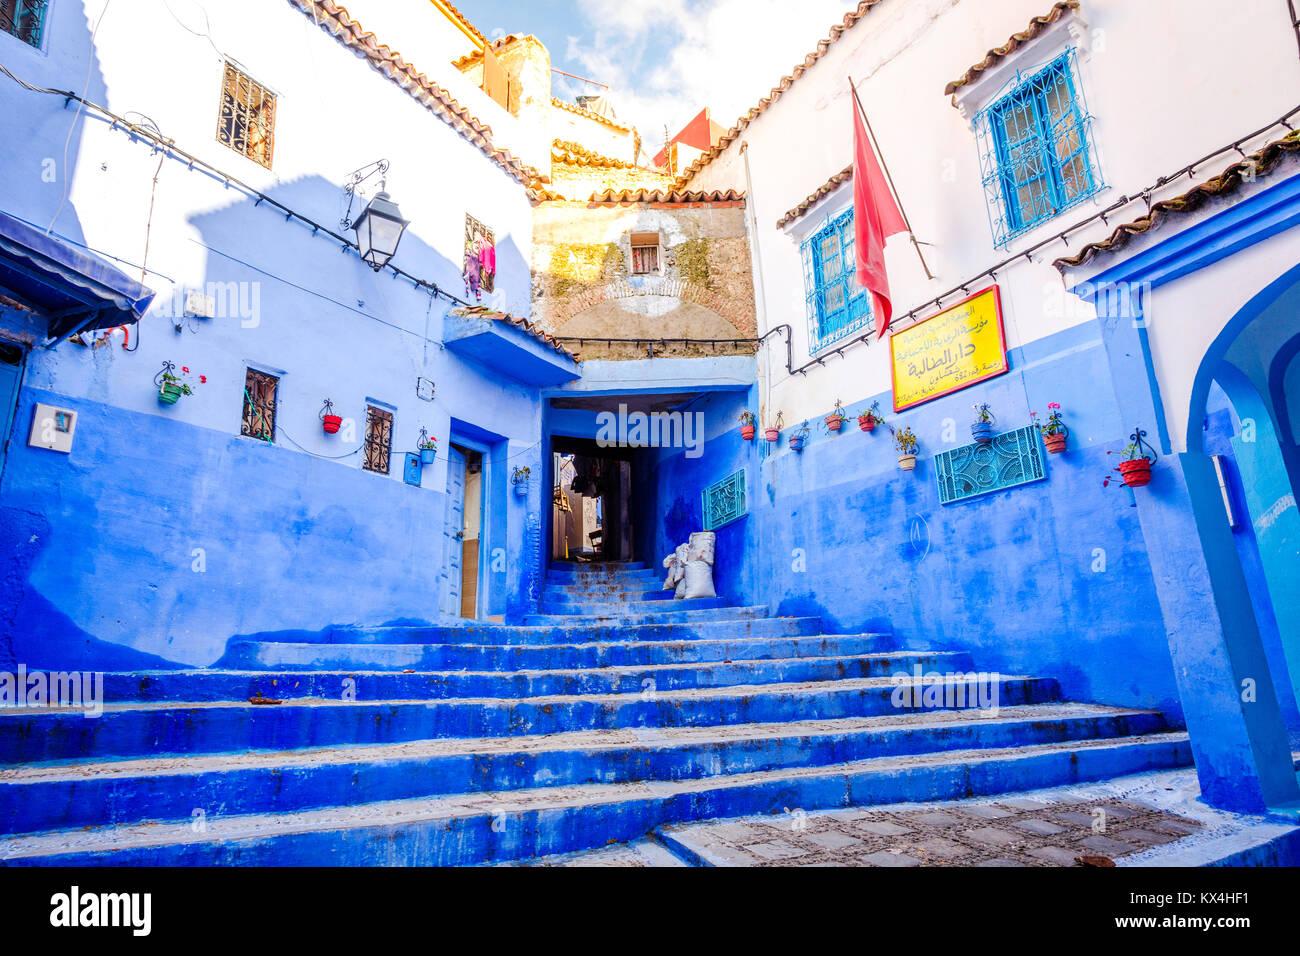 Blau Treppen in Chefchaouen, berühmten blauen Stadt, Marokko Stockfoto